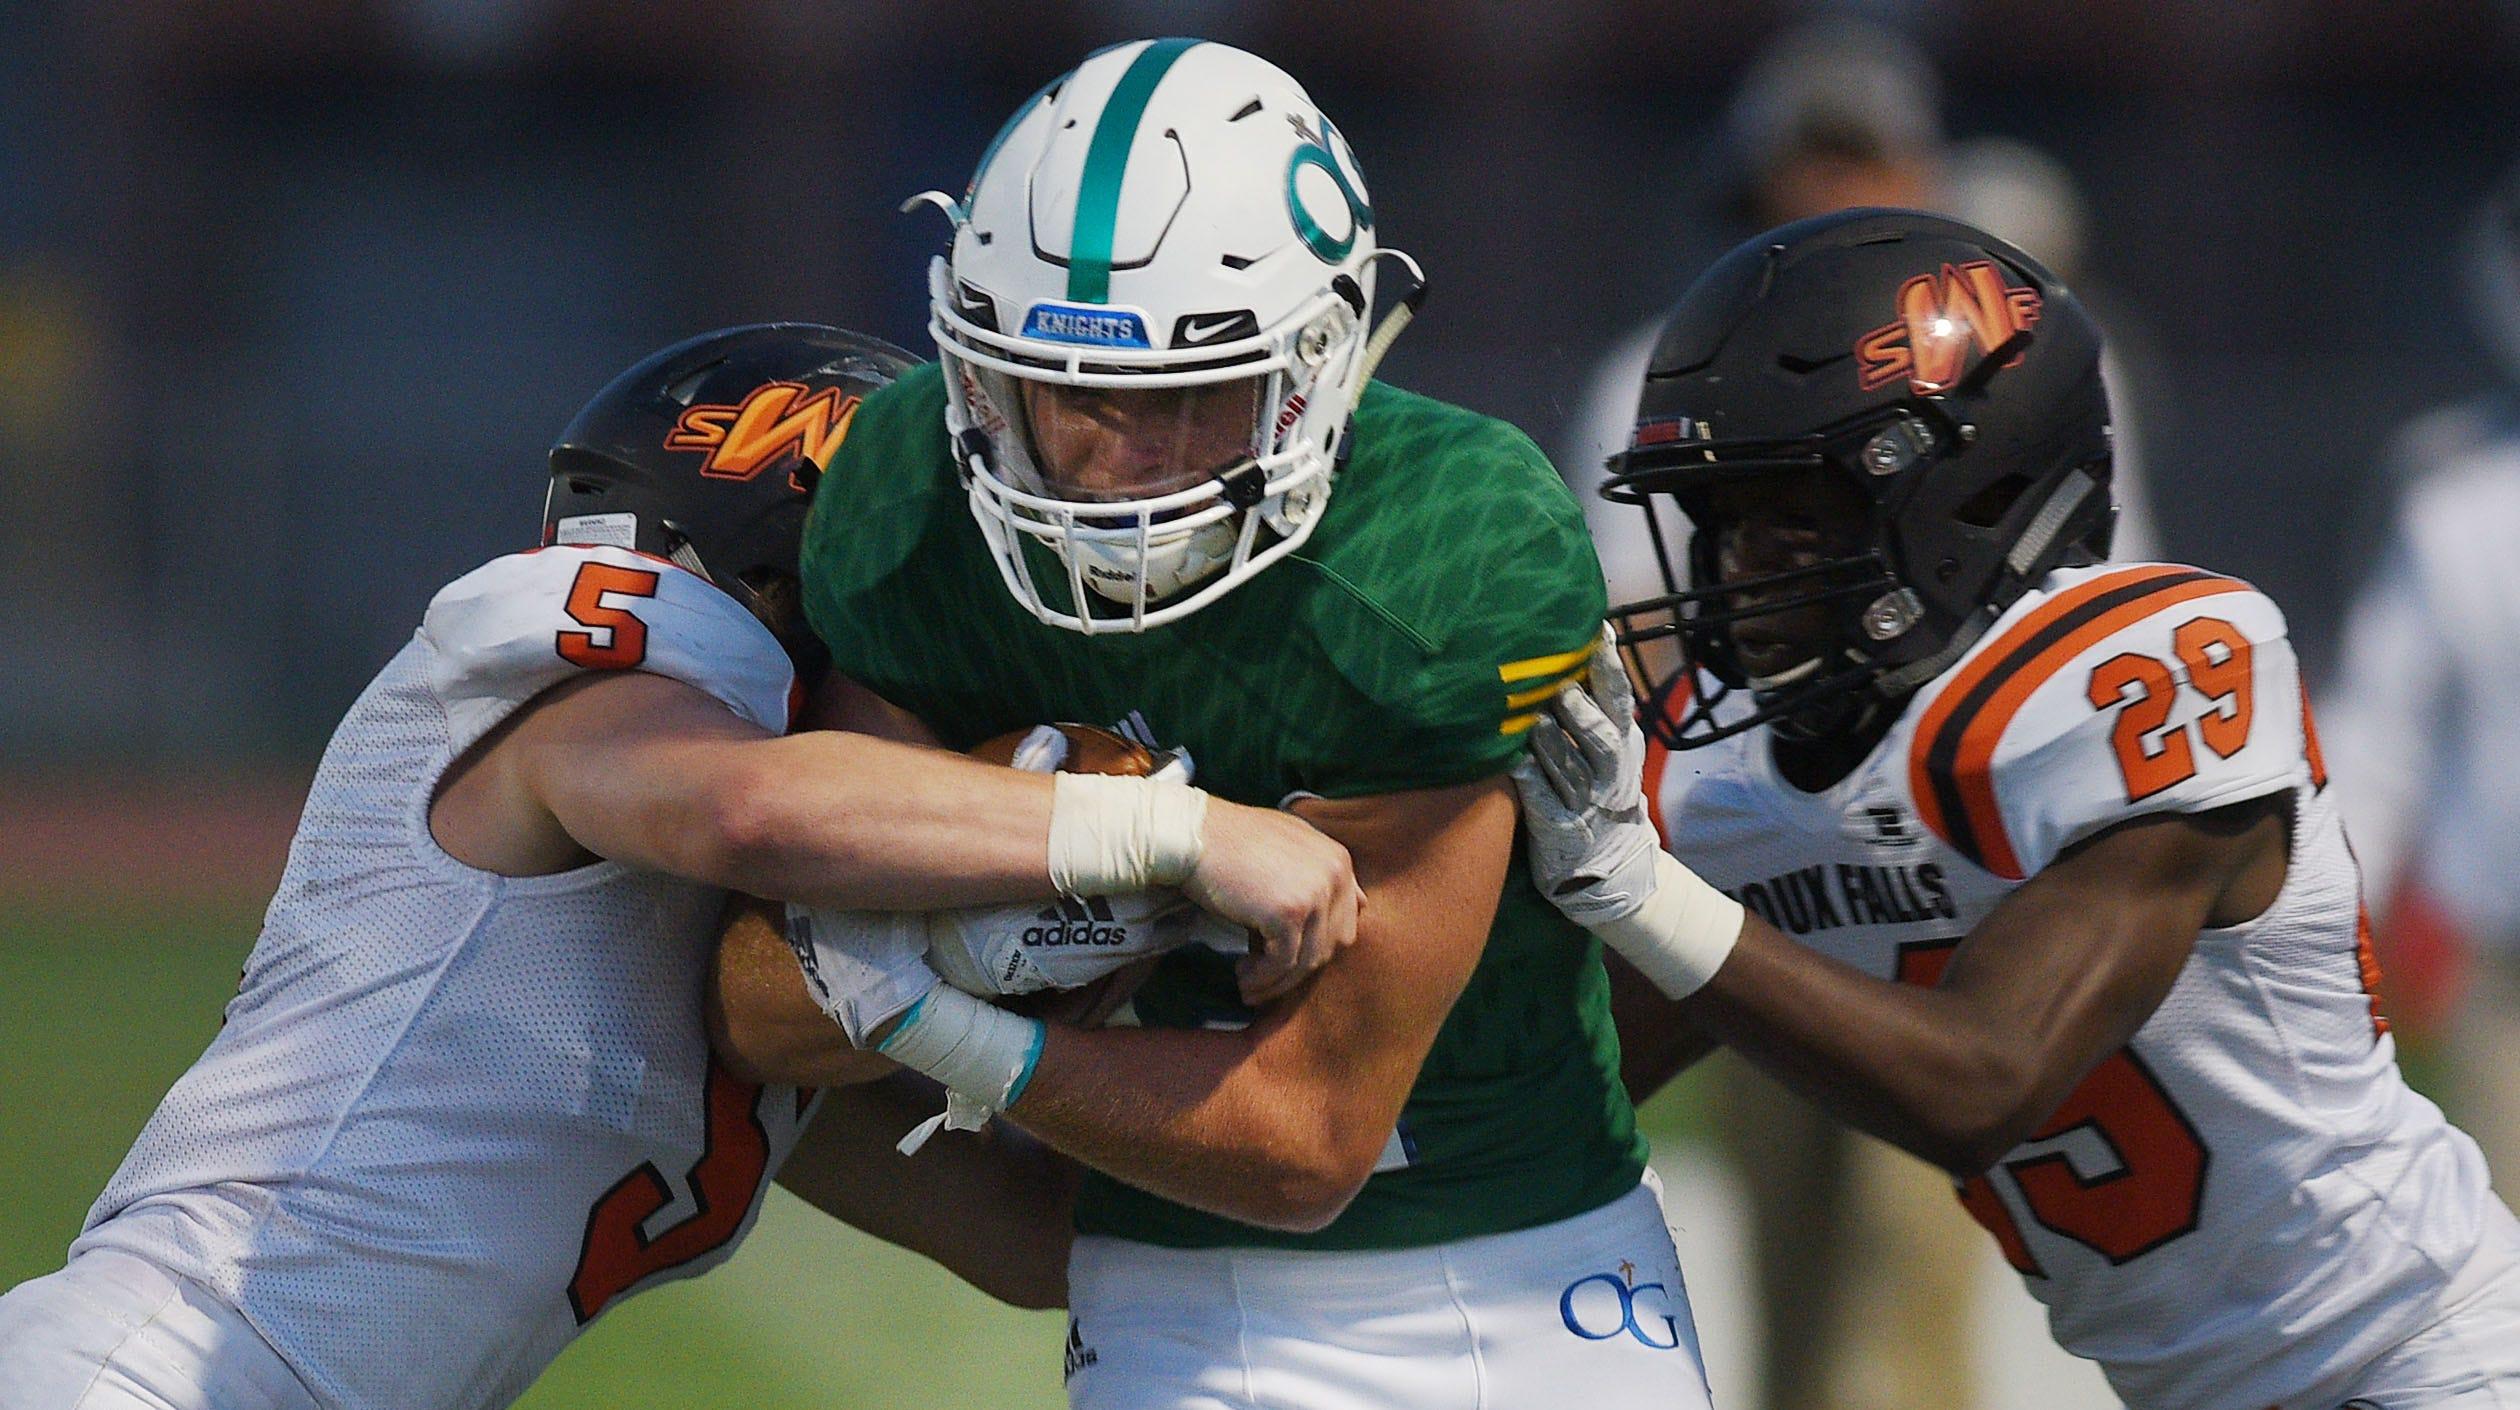 O'Gorman's Canyon Bauer is tackled by Washington defense during the 40th Bob Burns Dakota Bowl Saturday, Sept 8, at Howard Wood Field in Sioux Falls.